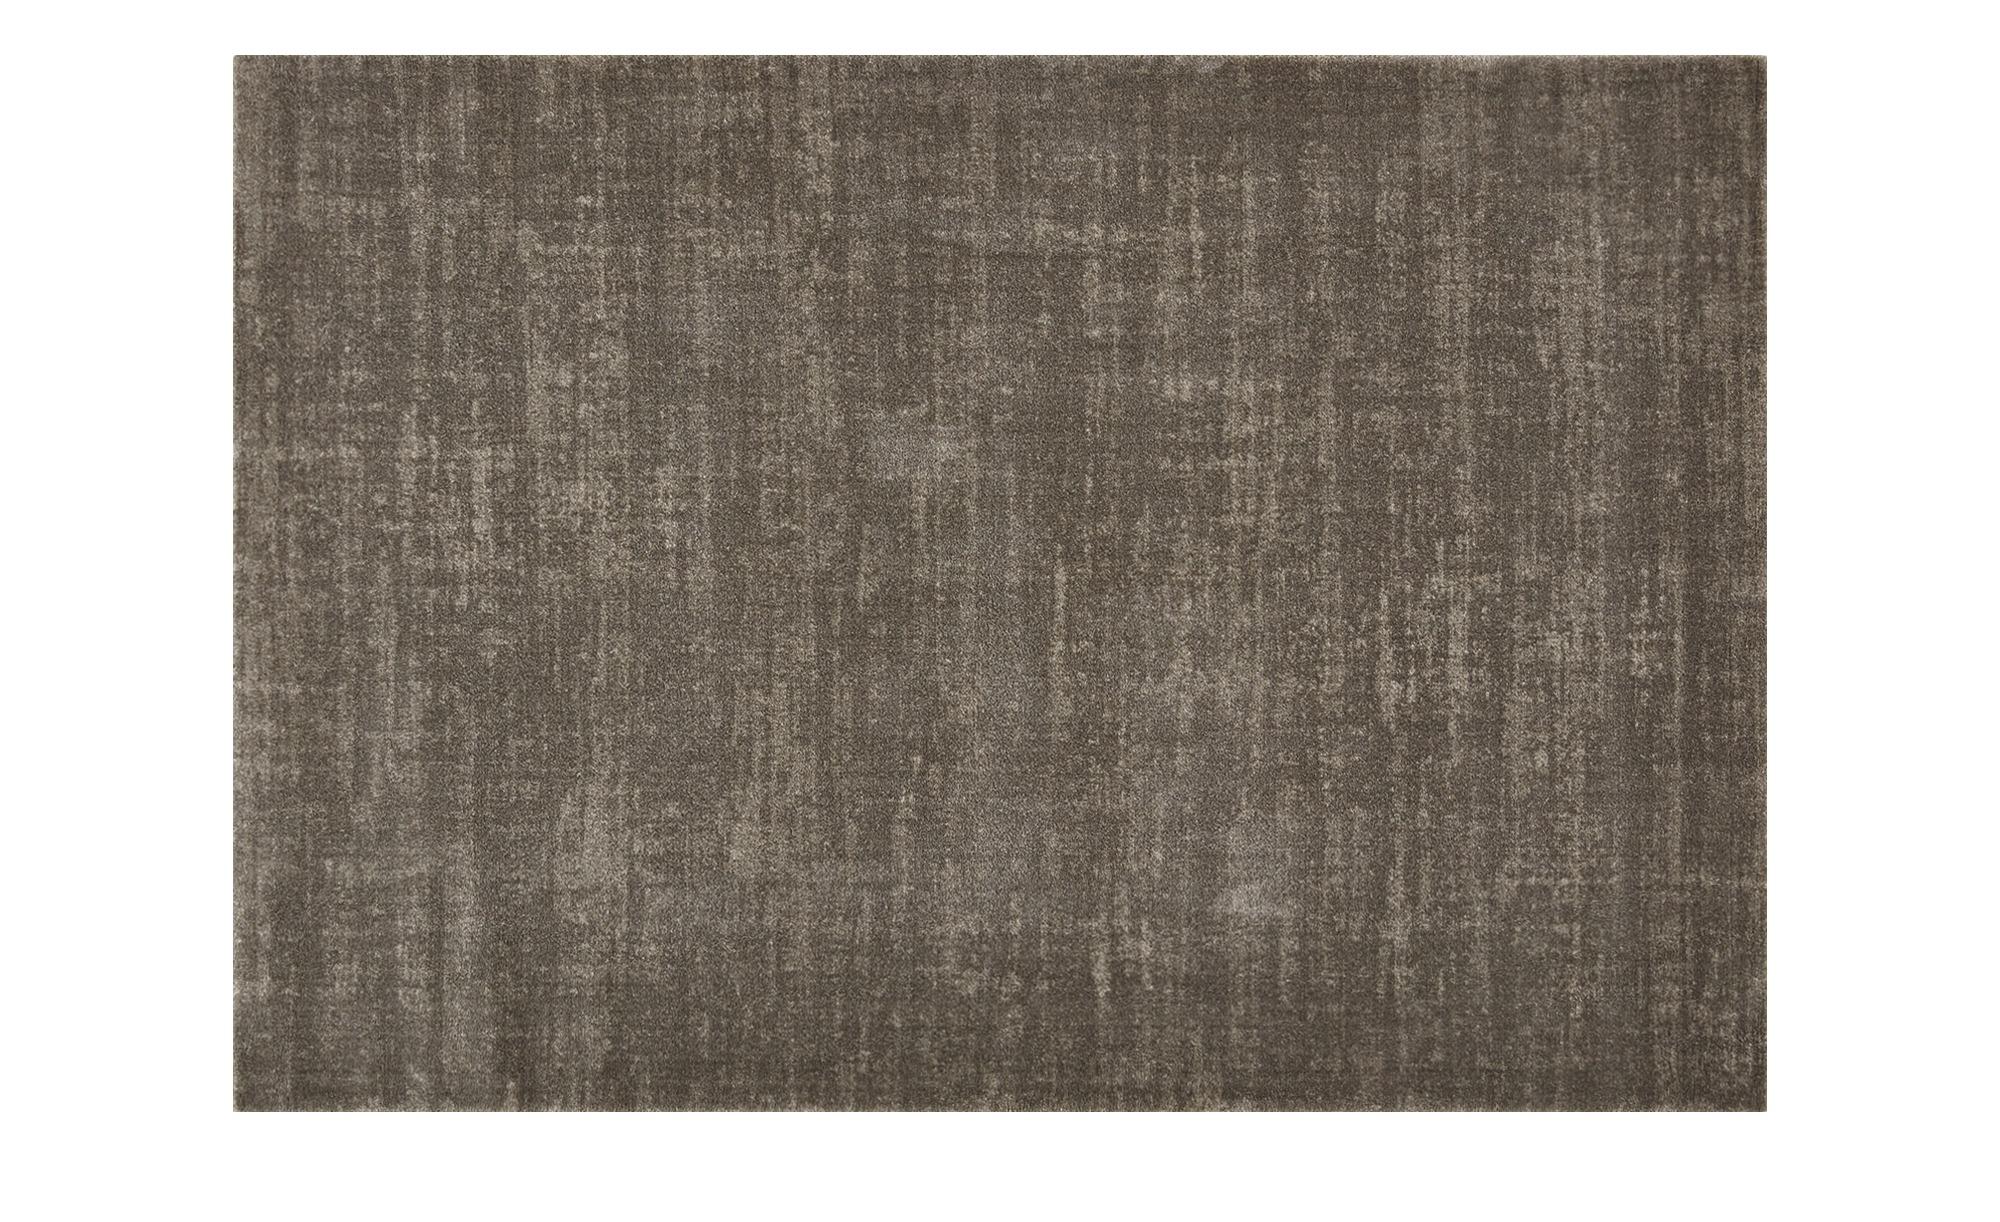 webteppich futuro breite 120 cm h he grau online kaufen. Black Bedroom Furniture Sets. Home Design Ideas